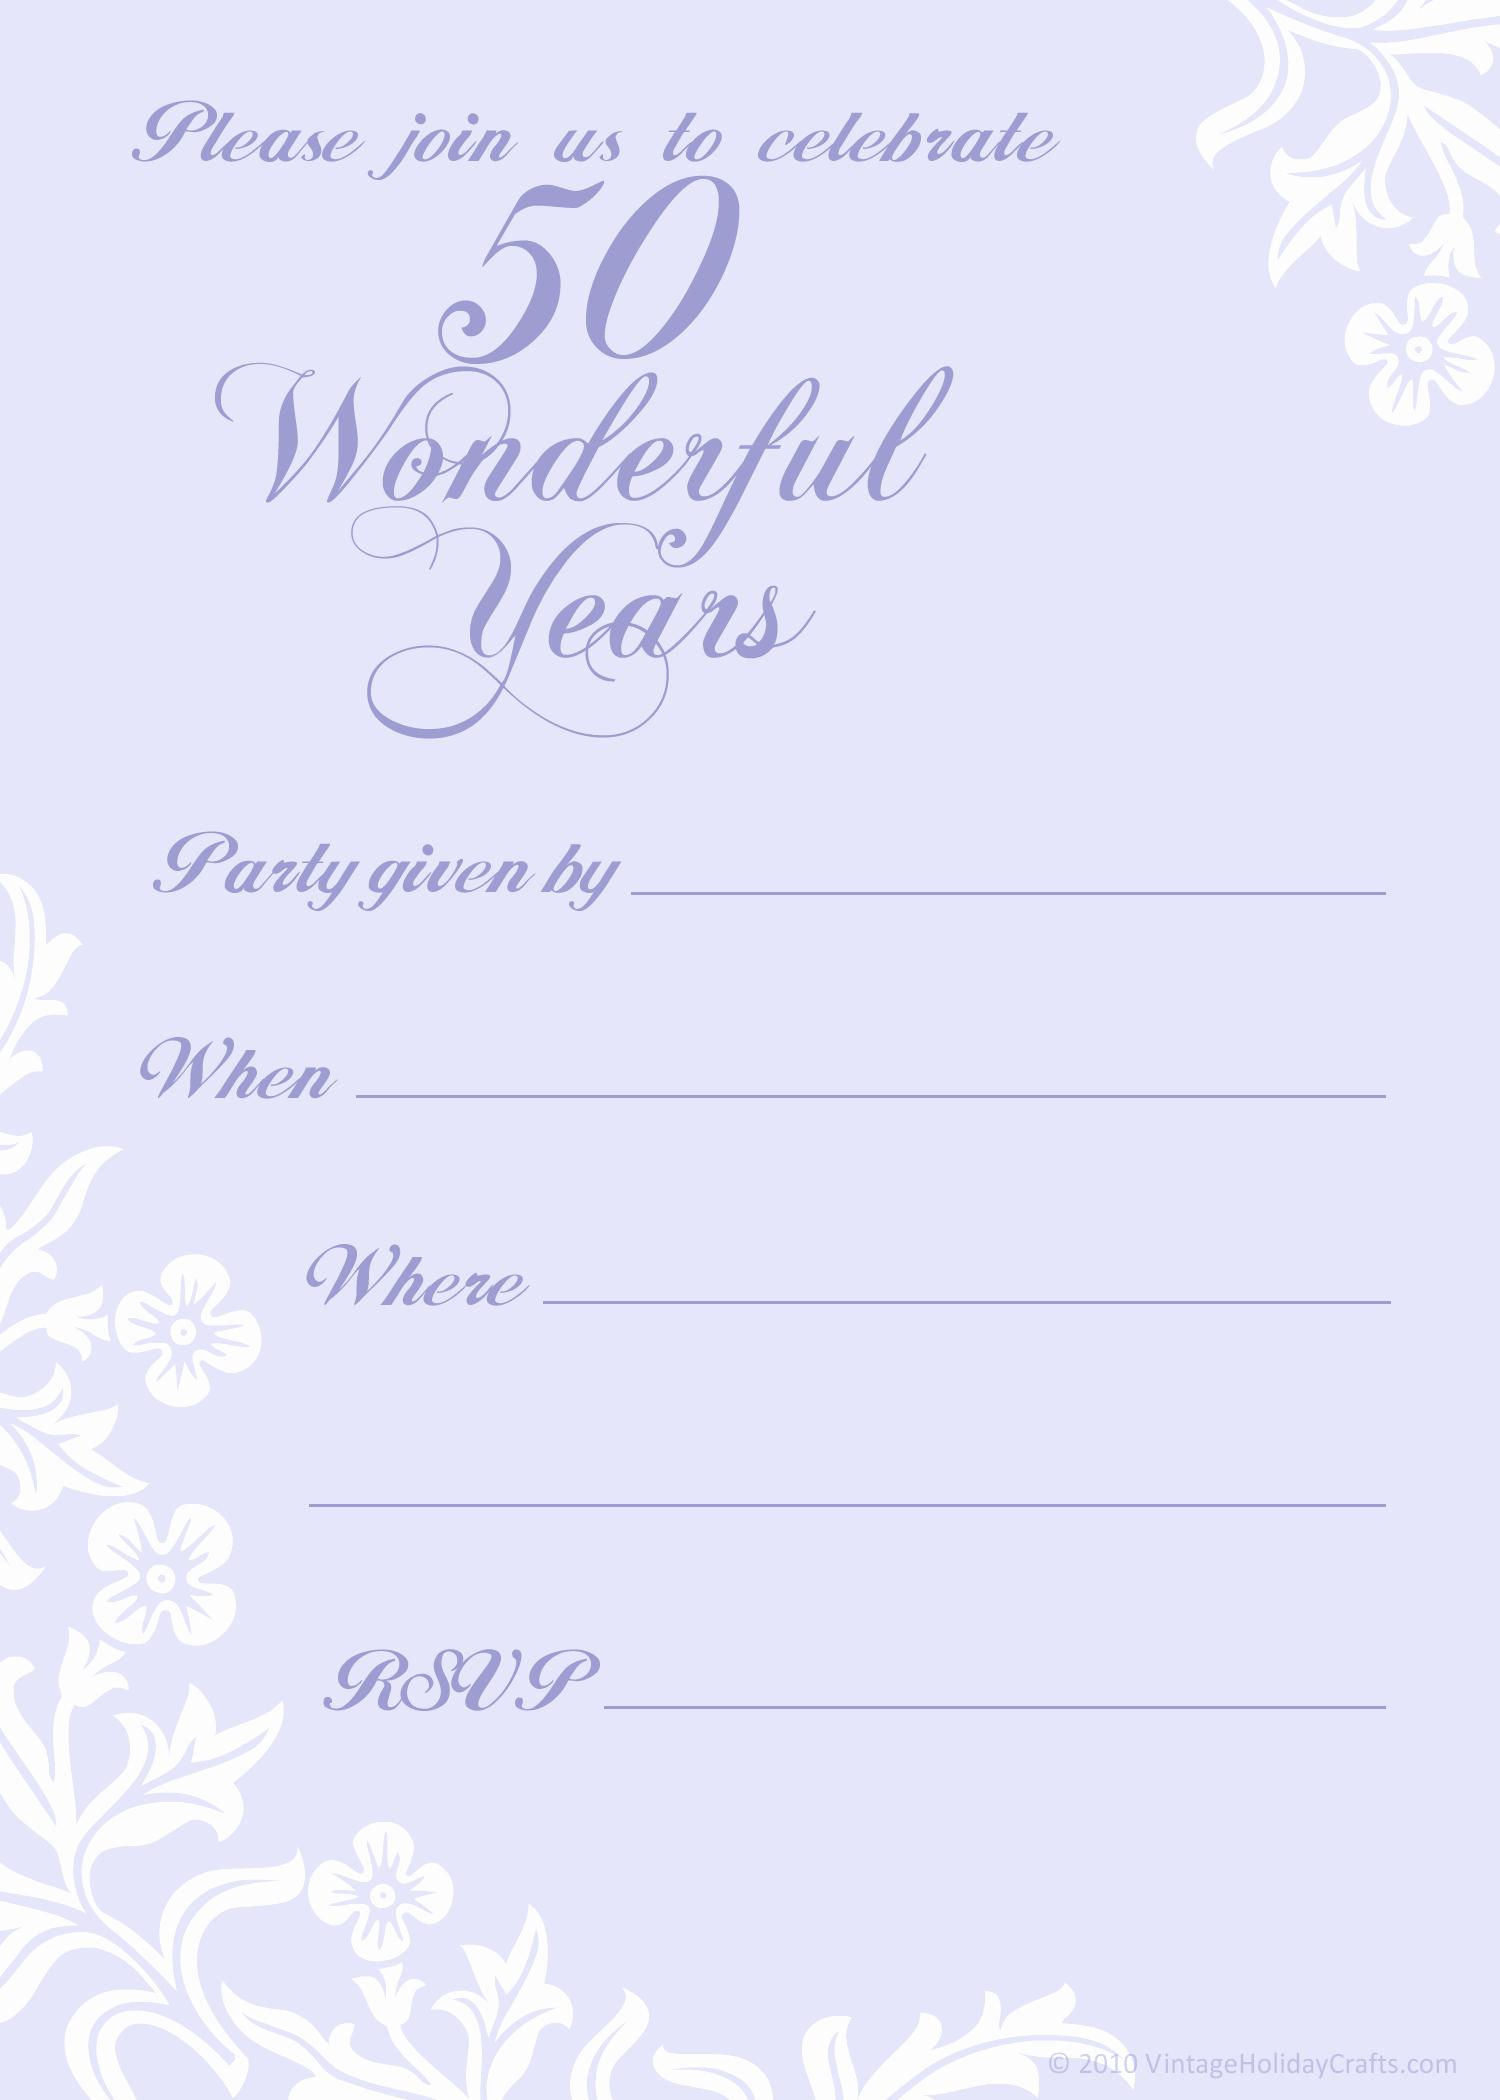 50th Anniversary Invitations Templates Inspirational Free 50th Wedding Anniversary Invitations Templates